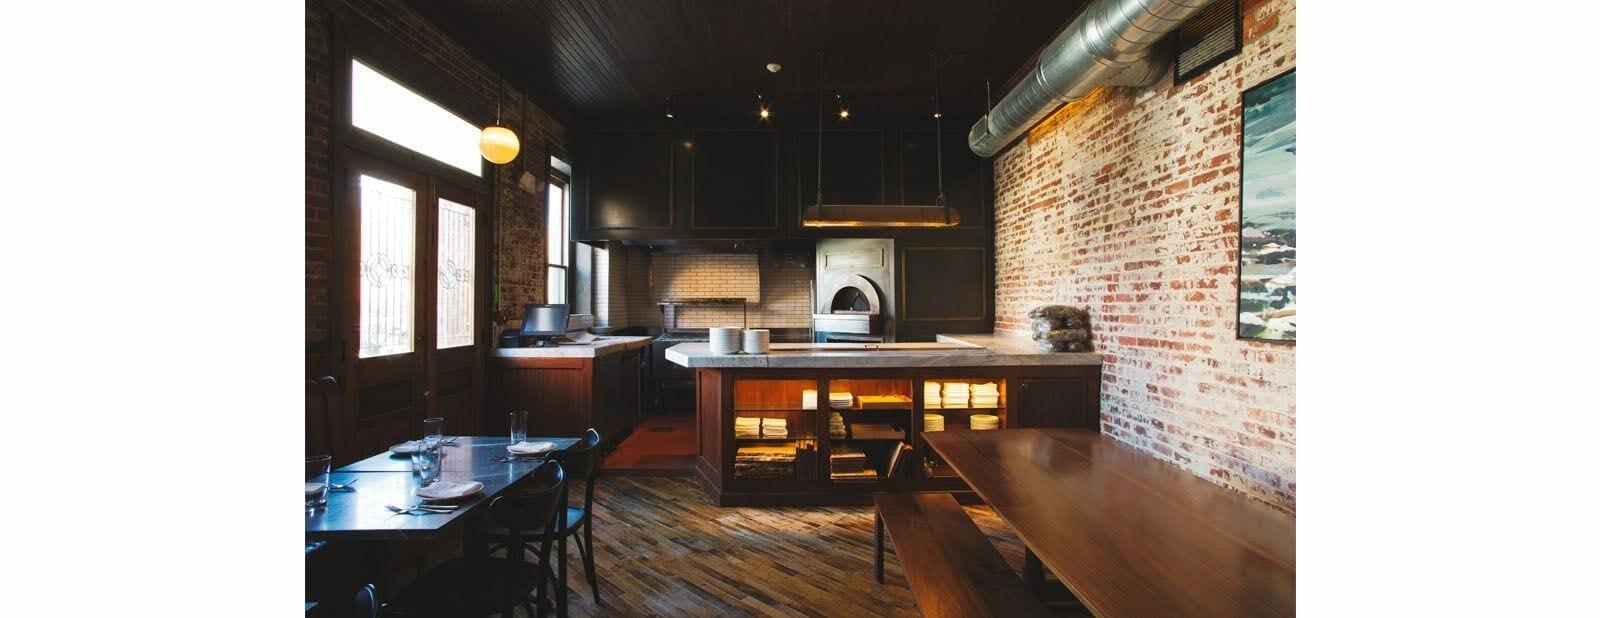 wm-mulherins-wood-stove